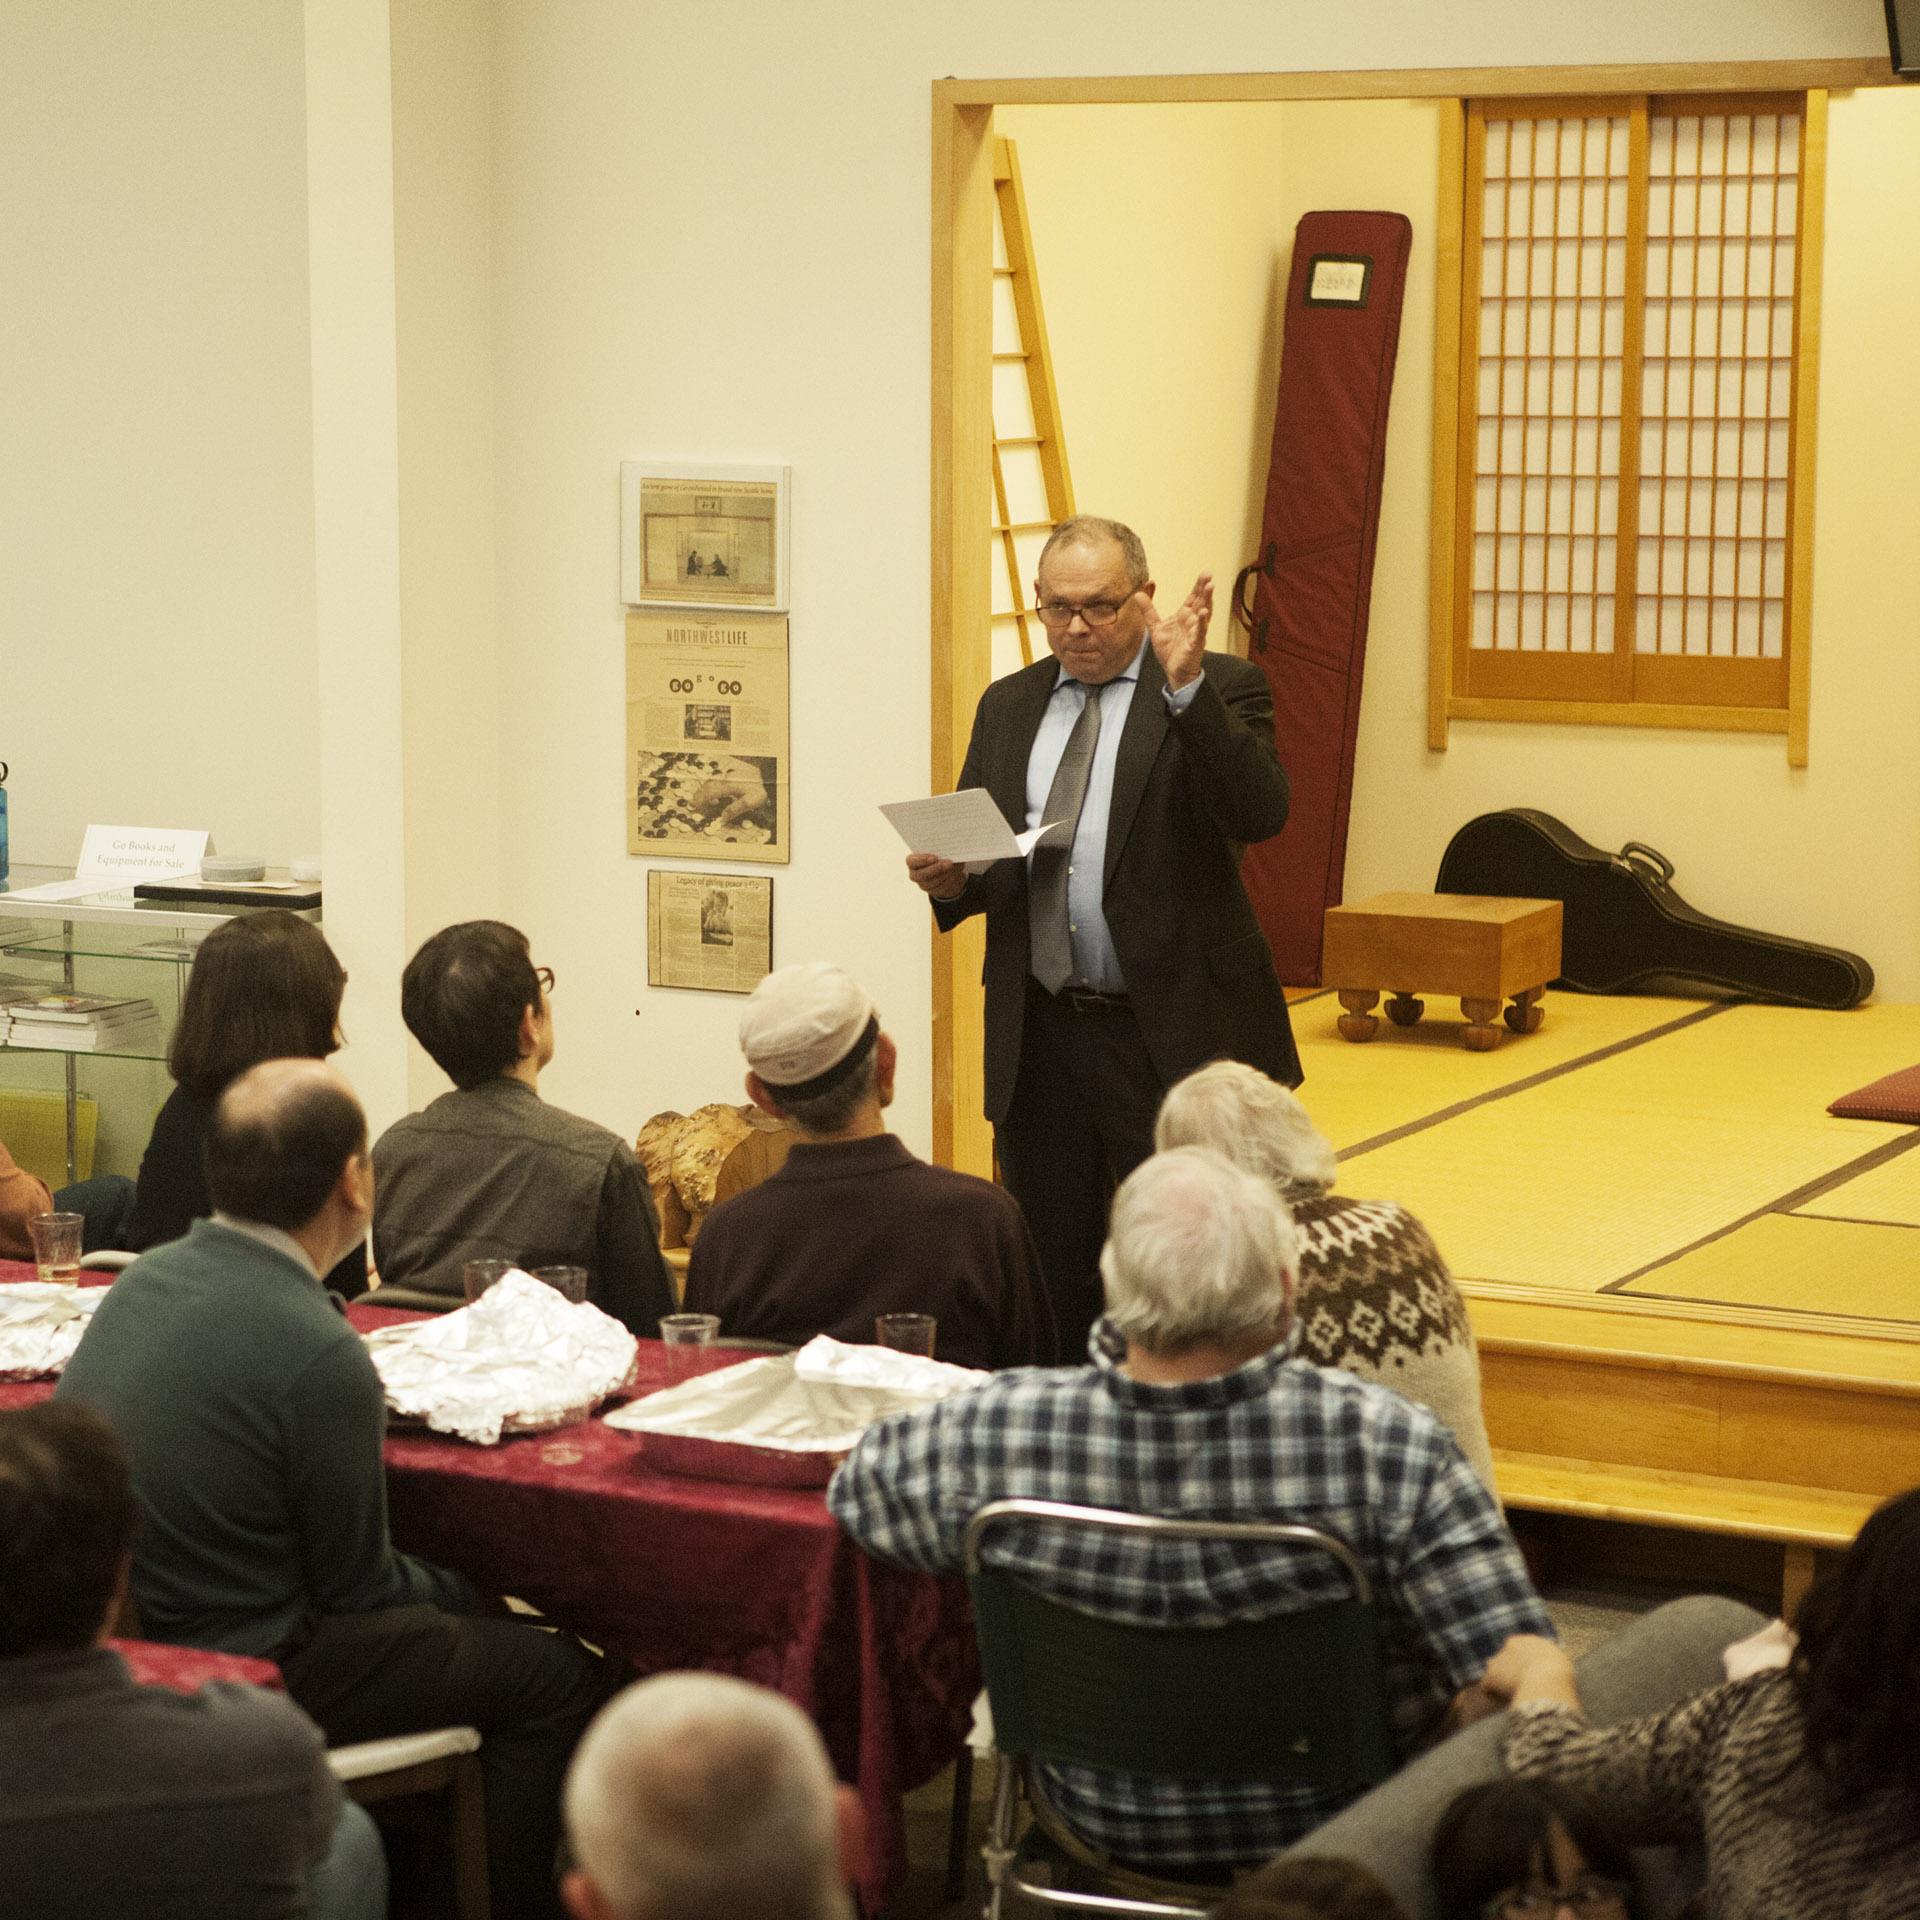 Harry van der Krogt from the European Go Cultural Center